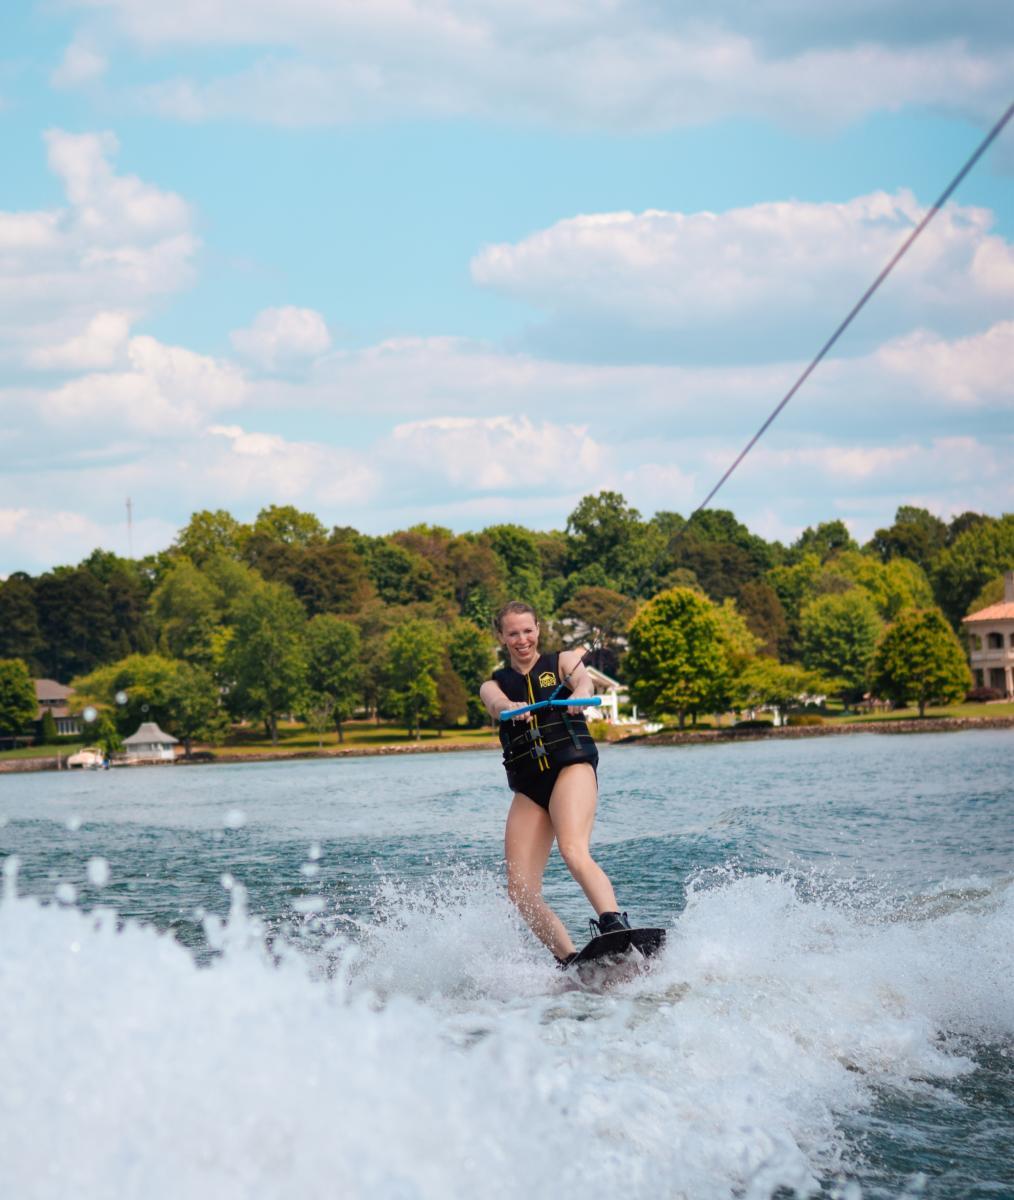 Ride LKN Cyndi Wakeboarding